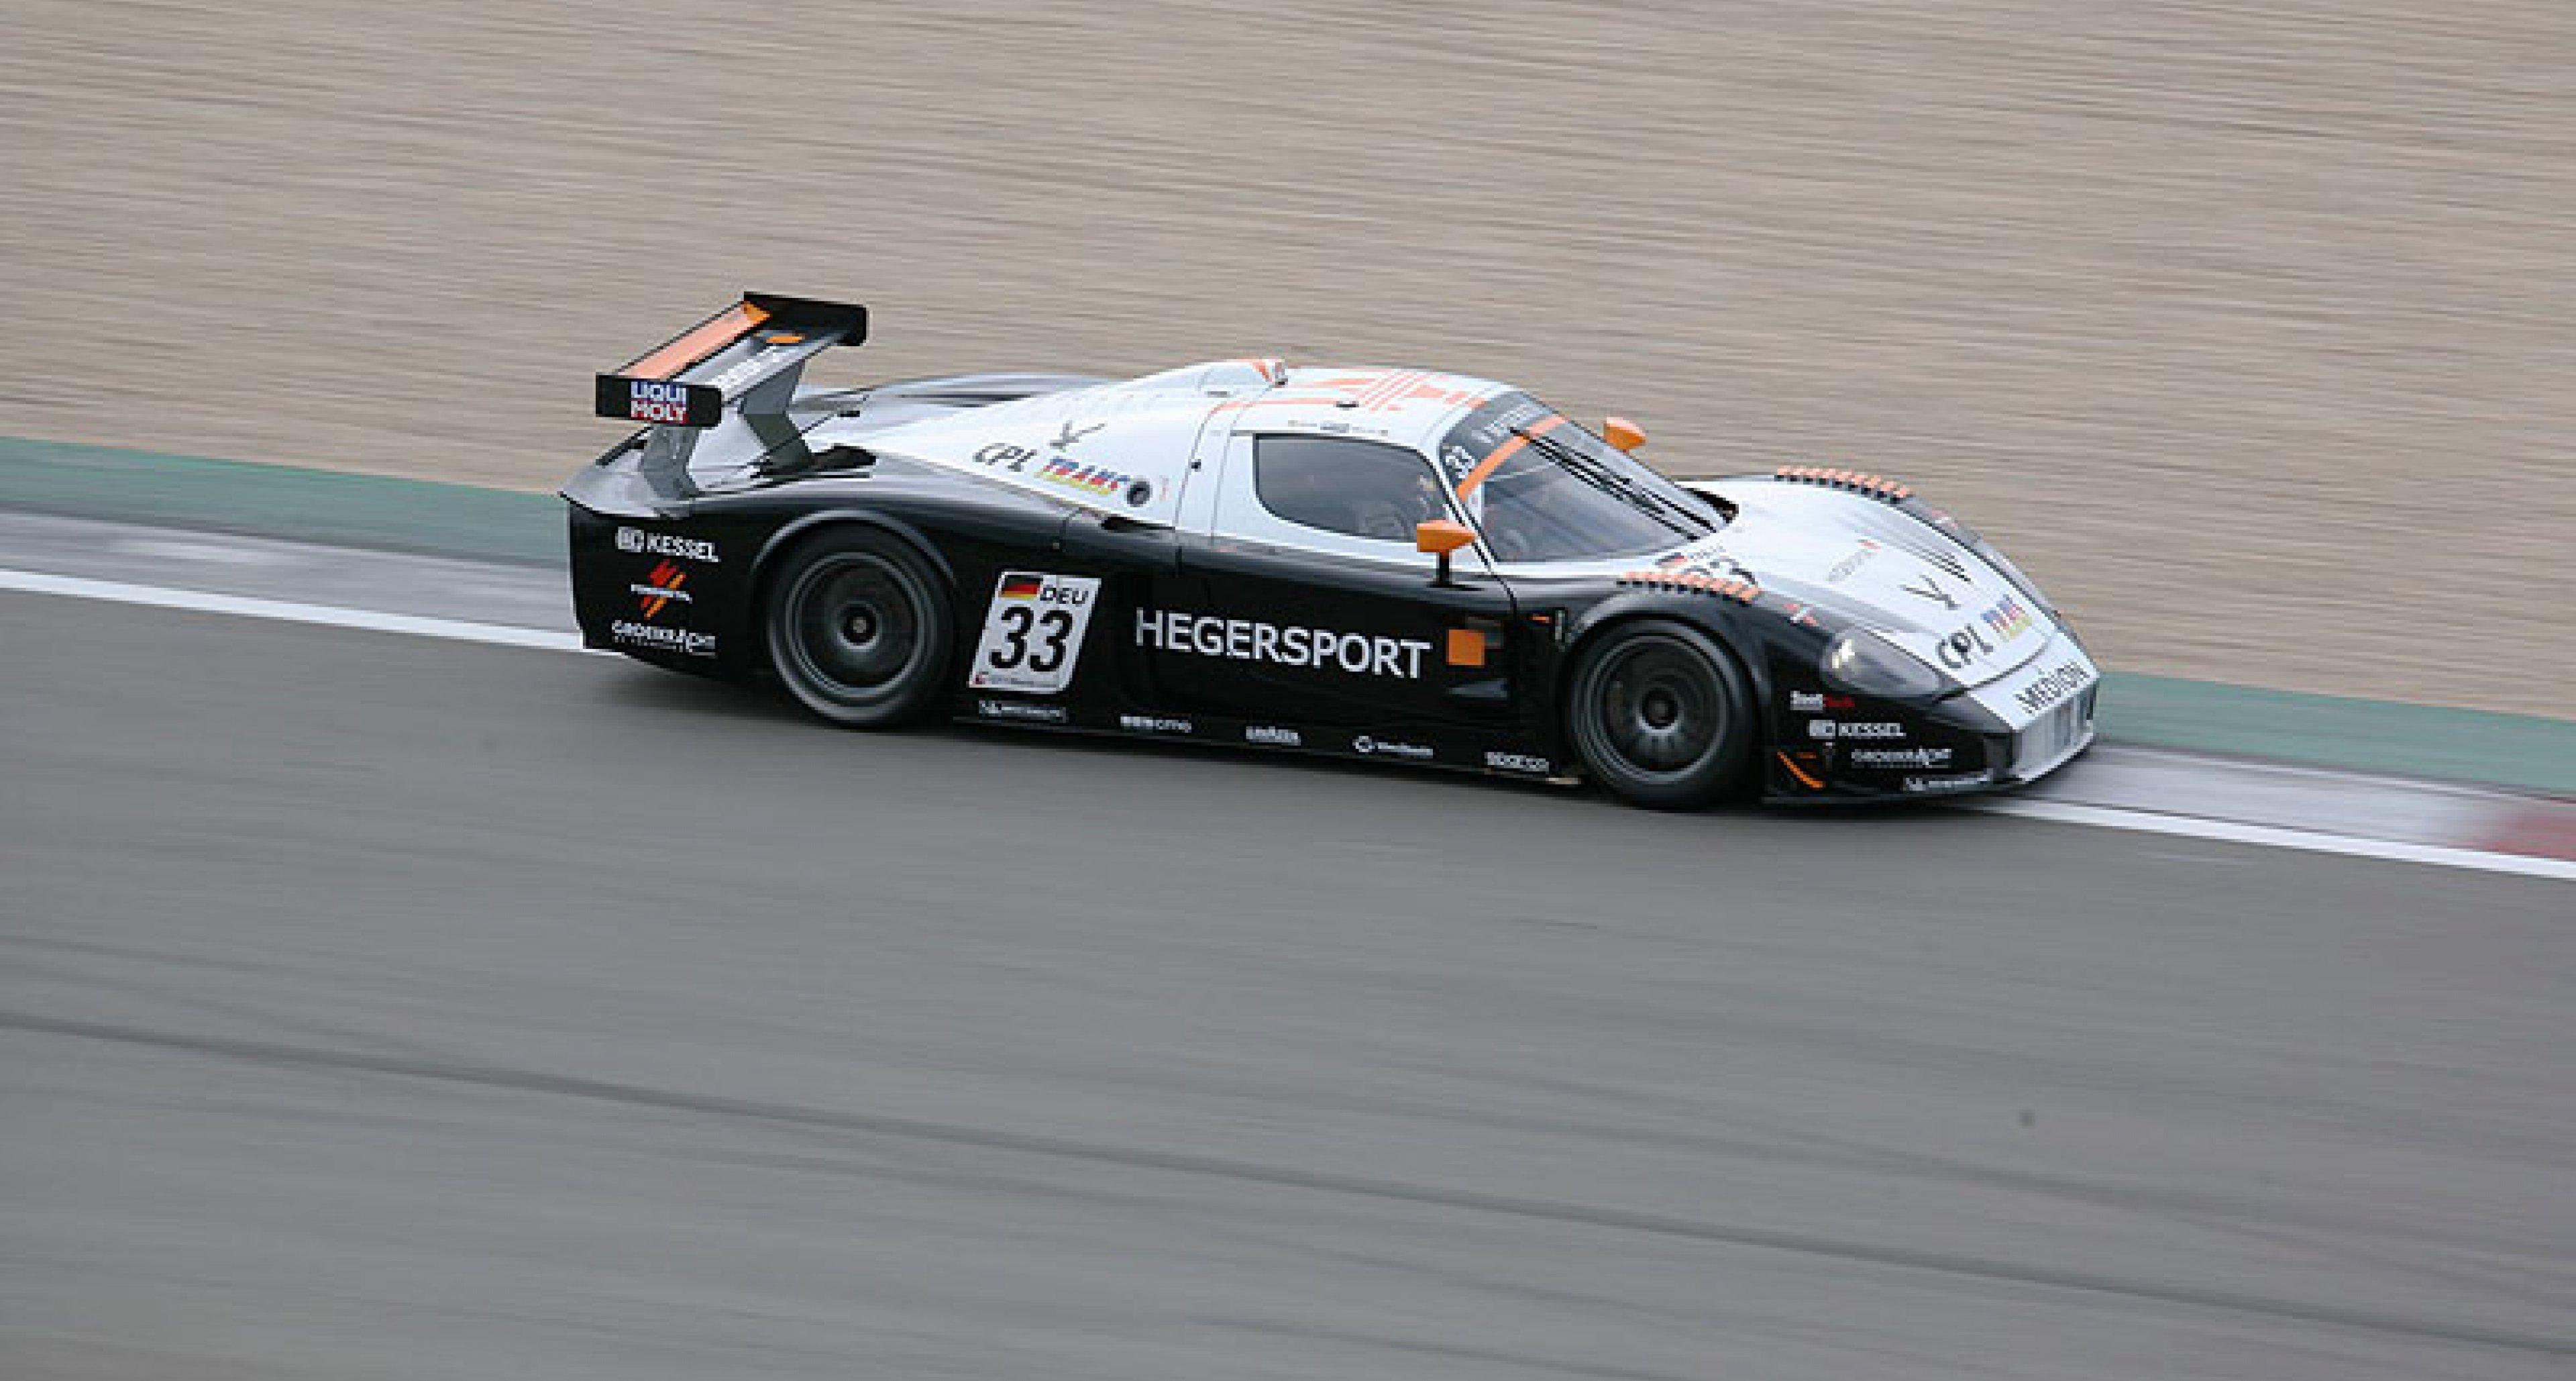 FIA-GT1-Weltmeisterschaft in der Eifel: Fotogalerie